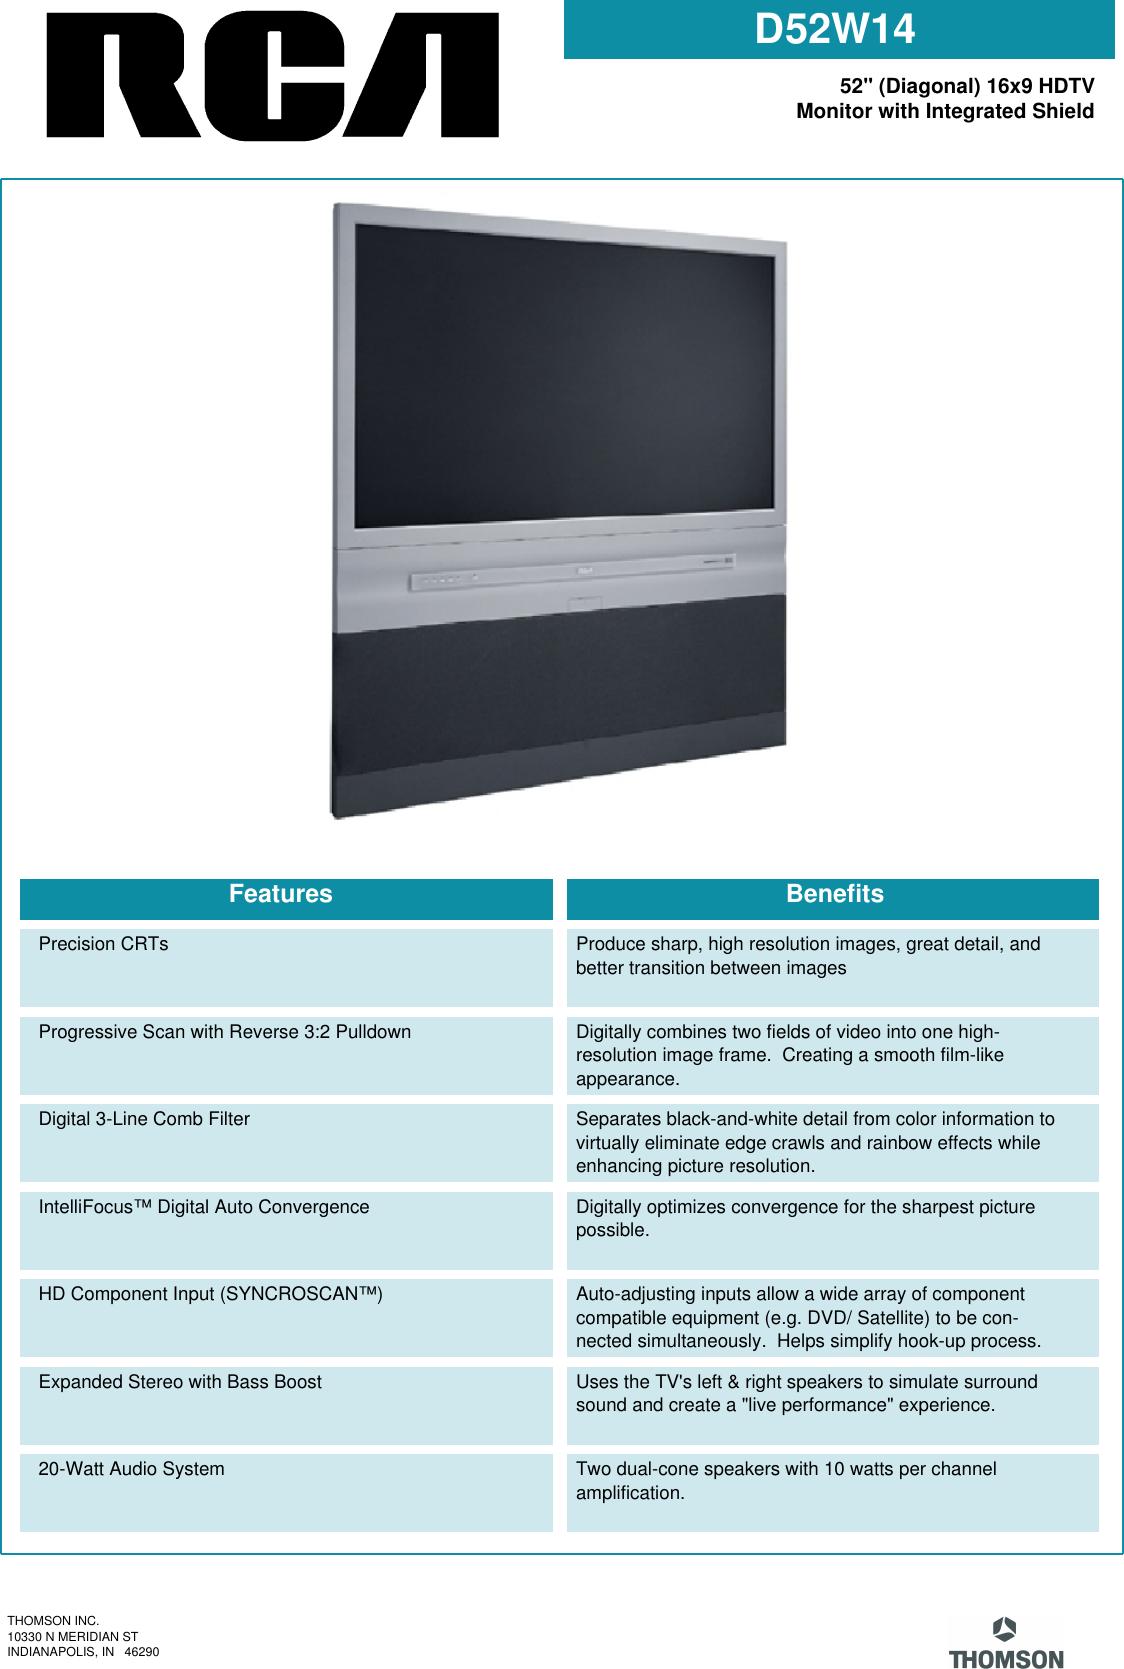 Rca D52W14 Users Manual